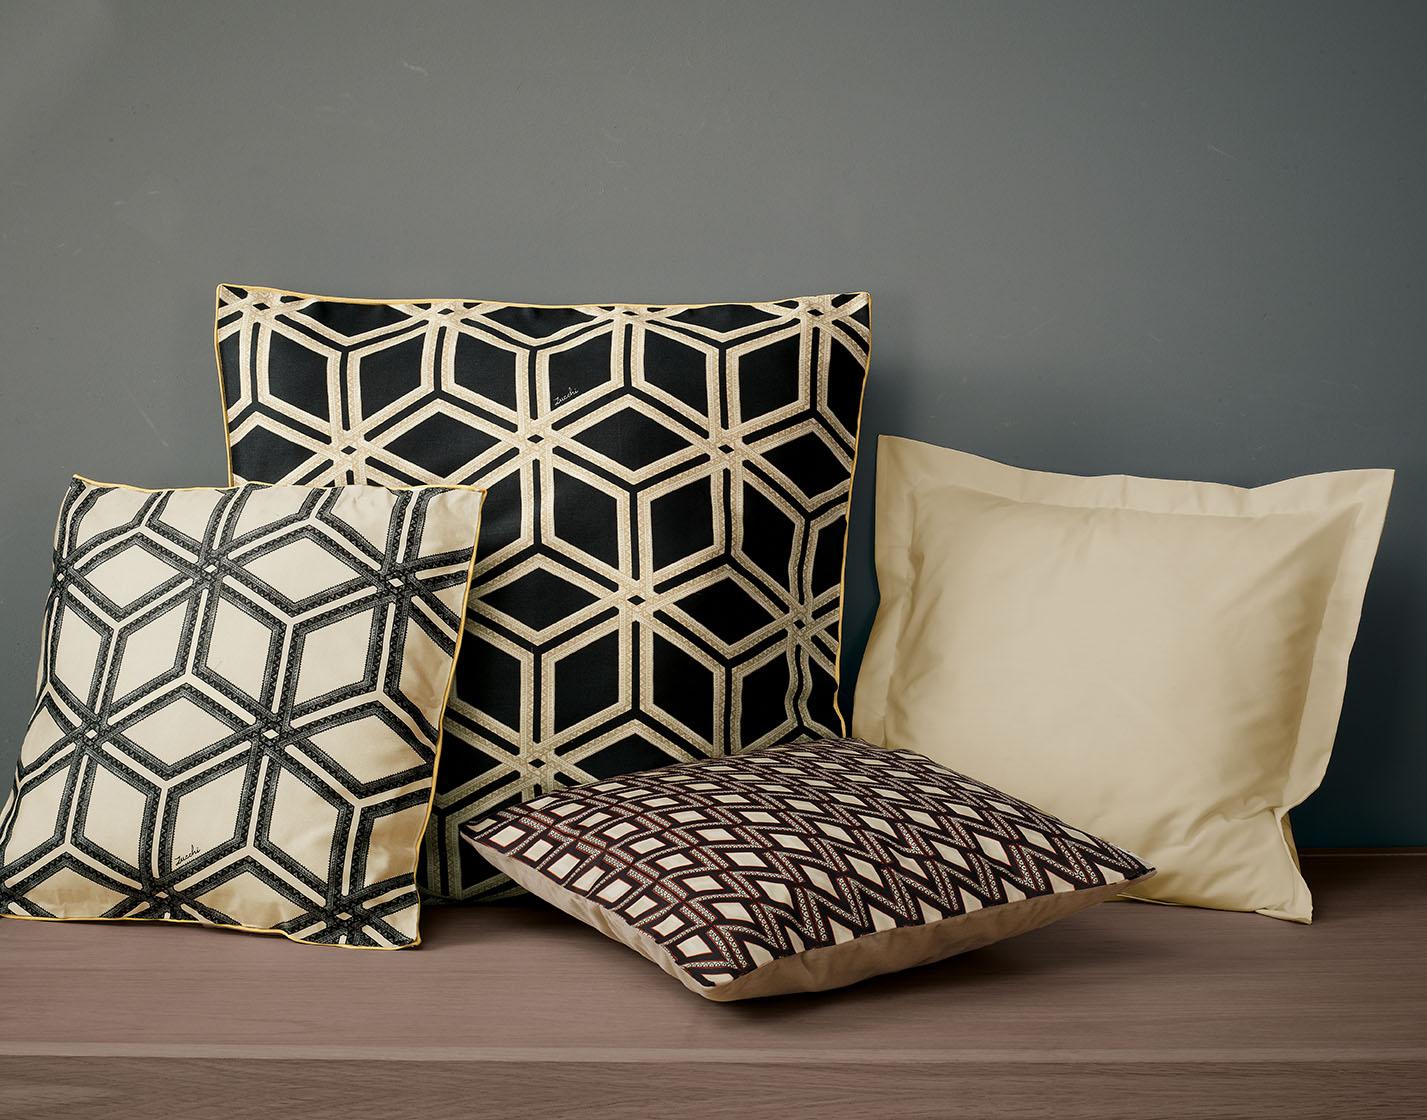 zucchi kollektion herbst winter 2015 16 teppich hemsing. Black Bedroom Furniture Sets. Home Design Ideas